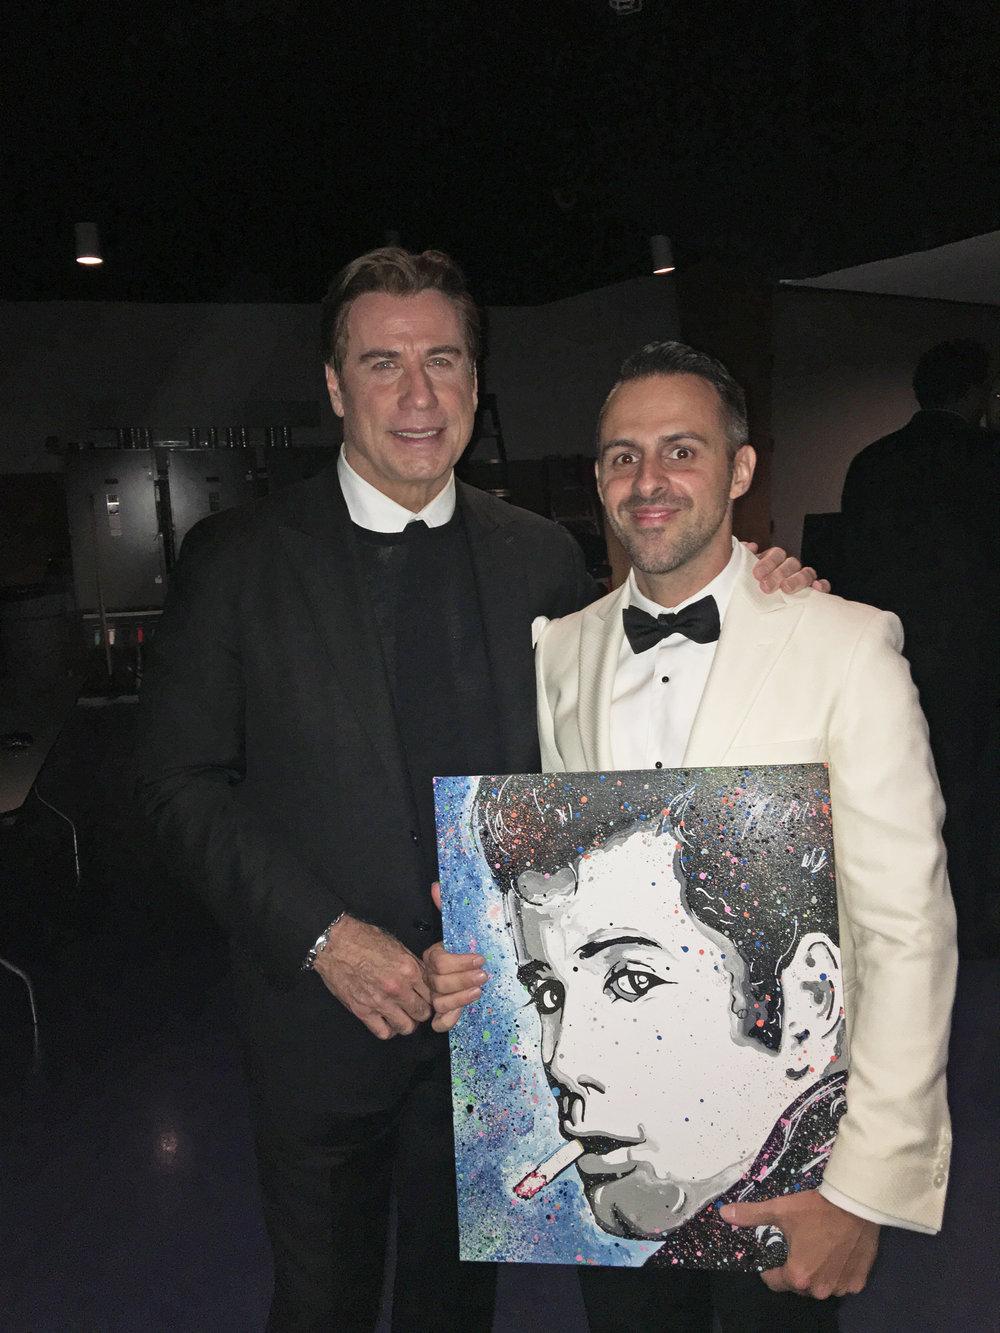 John Travolta x Matteo Charles